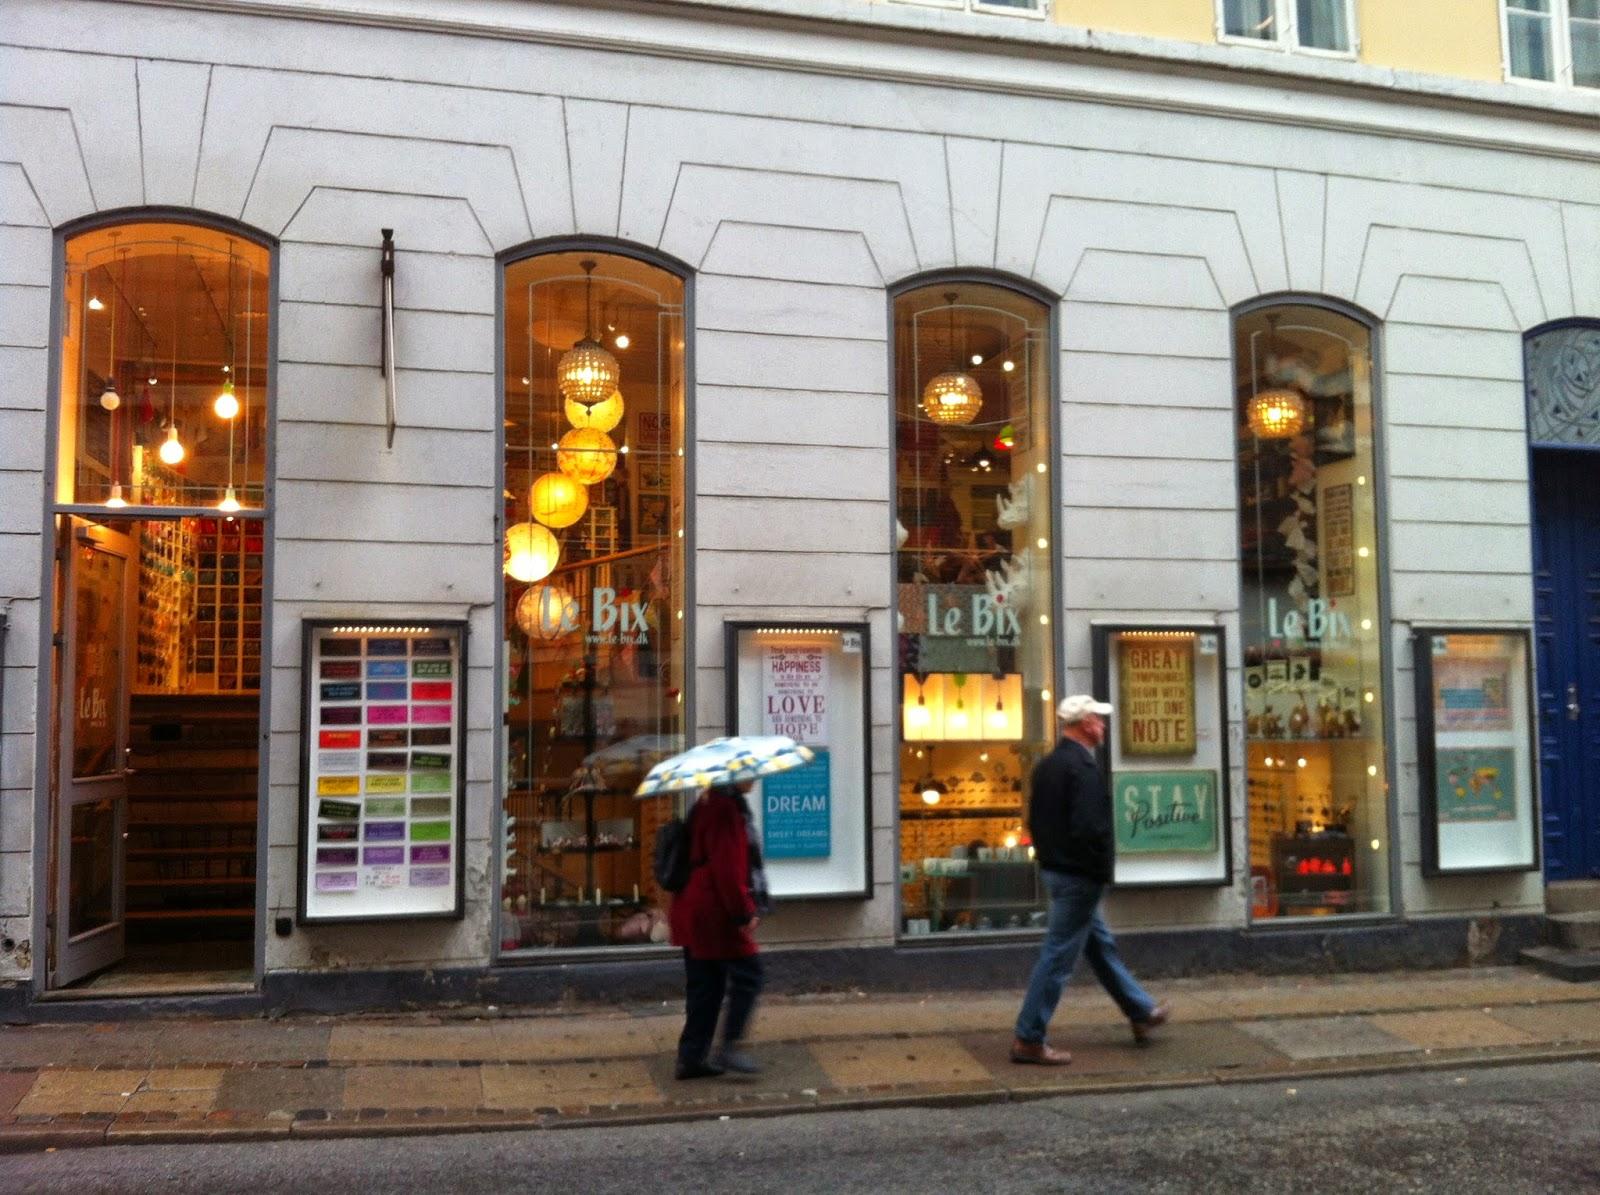 The oust die of Le Bix design store in Copenhagen